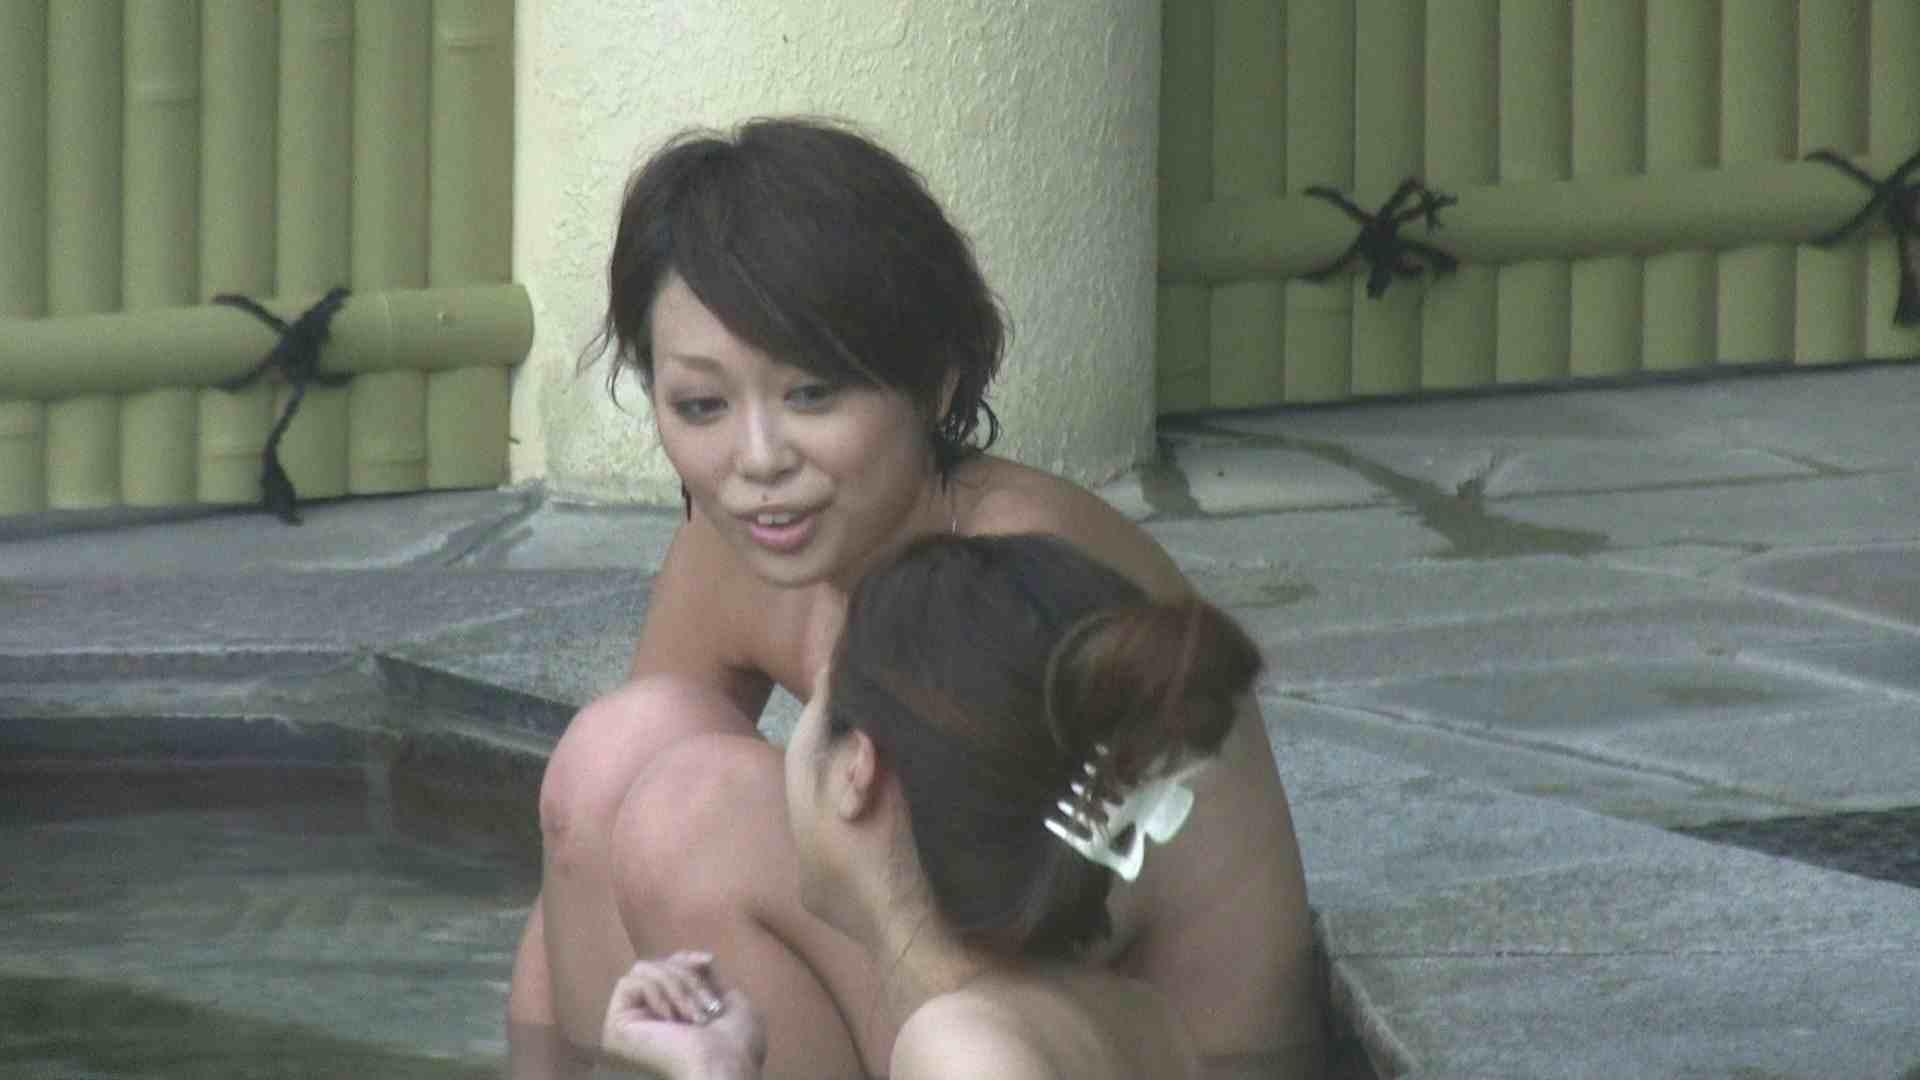 Aquaな露天風呂Vol.201 OLのエロ生活 | 露天風呂  96連発 91